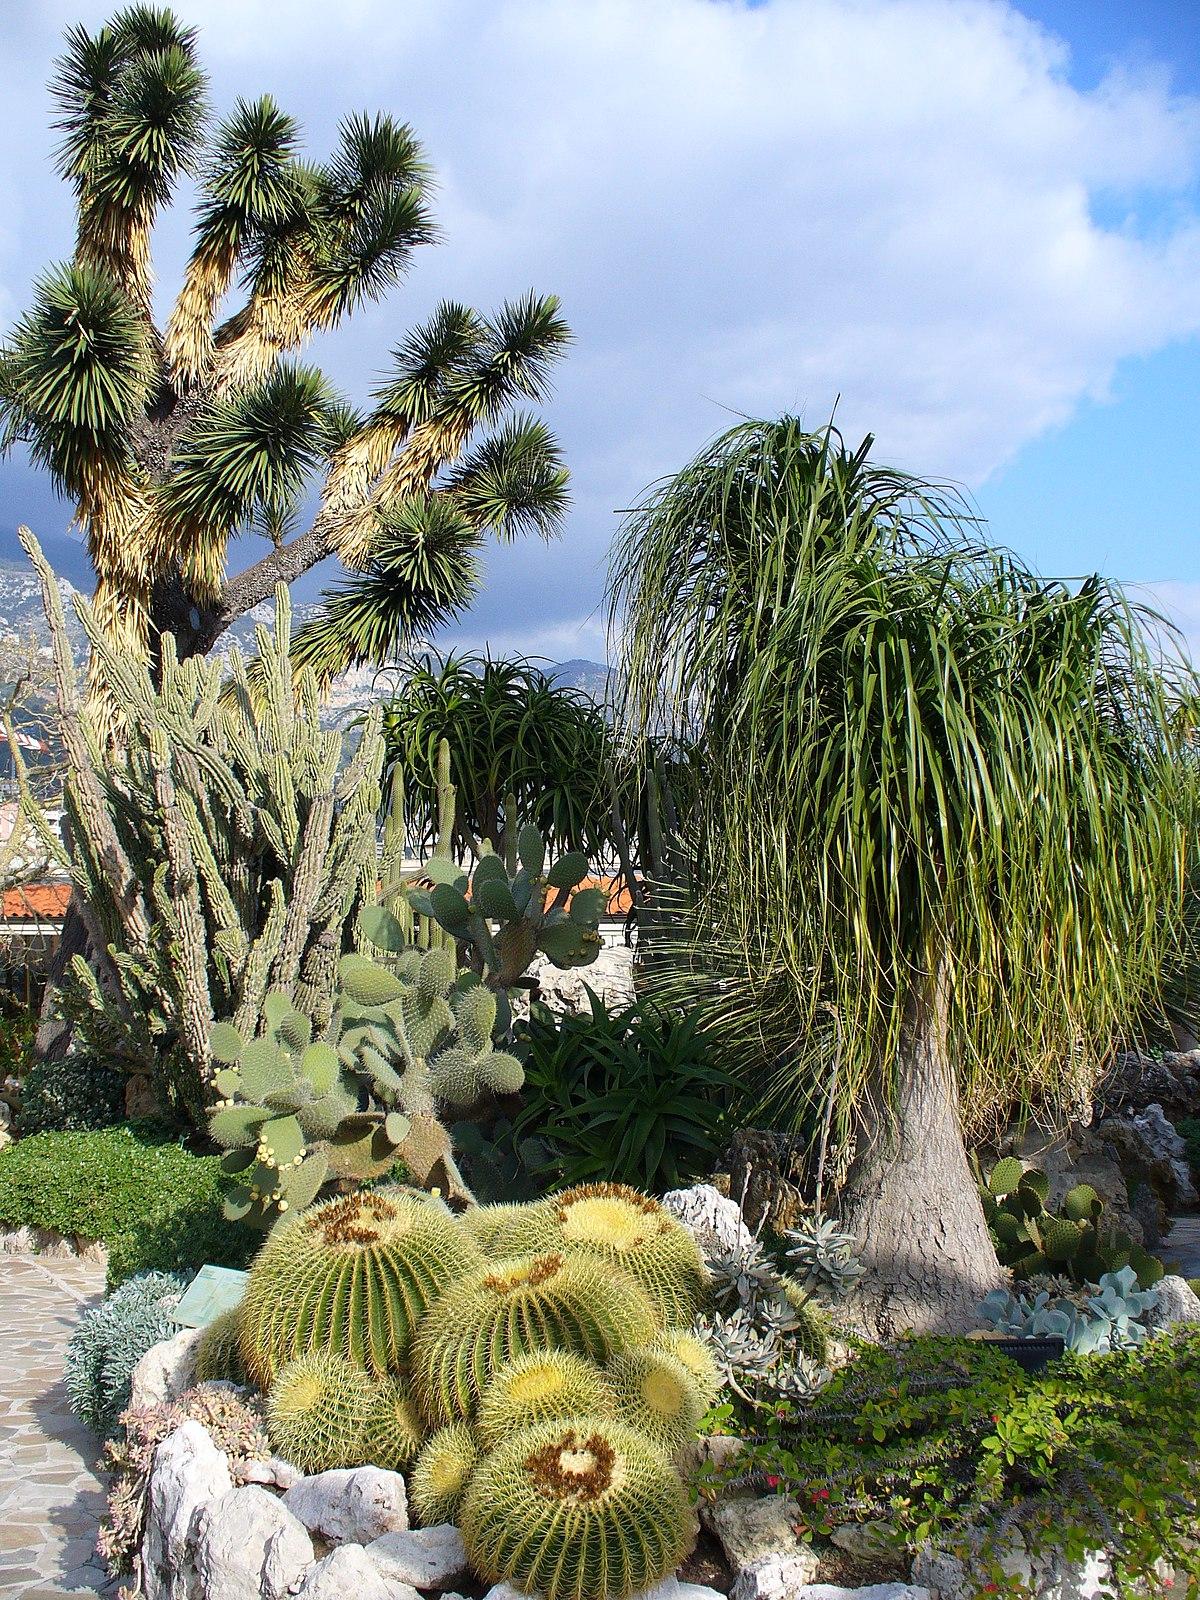 Jardin exotique de Monaco - Wikipedia, wolna encyklopedia